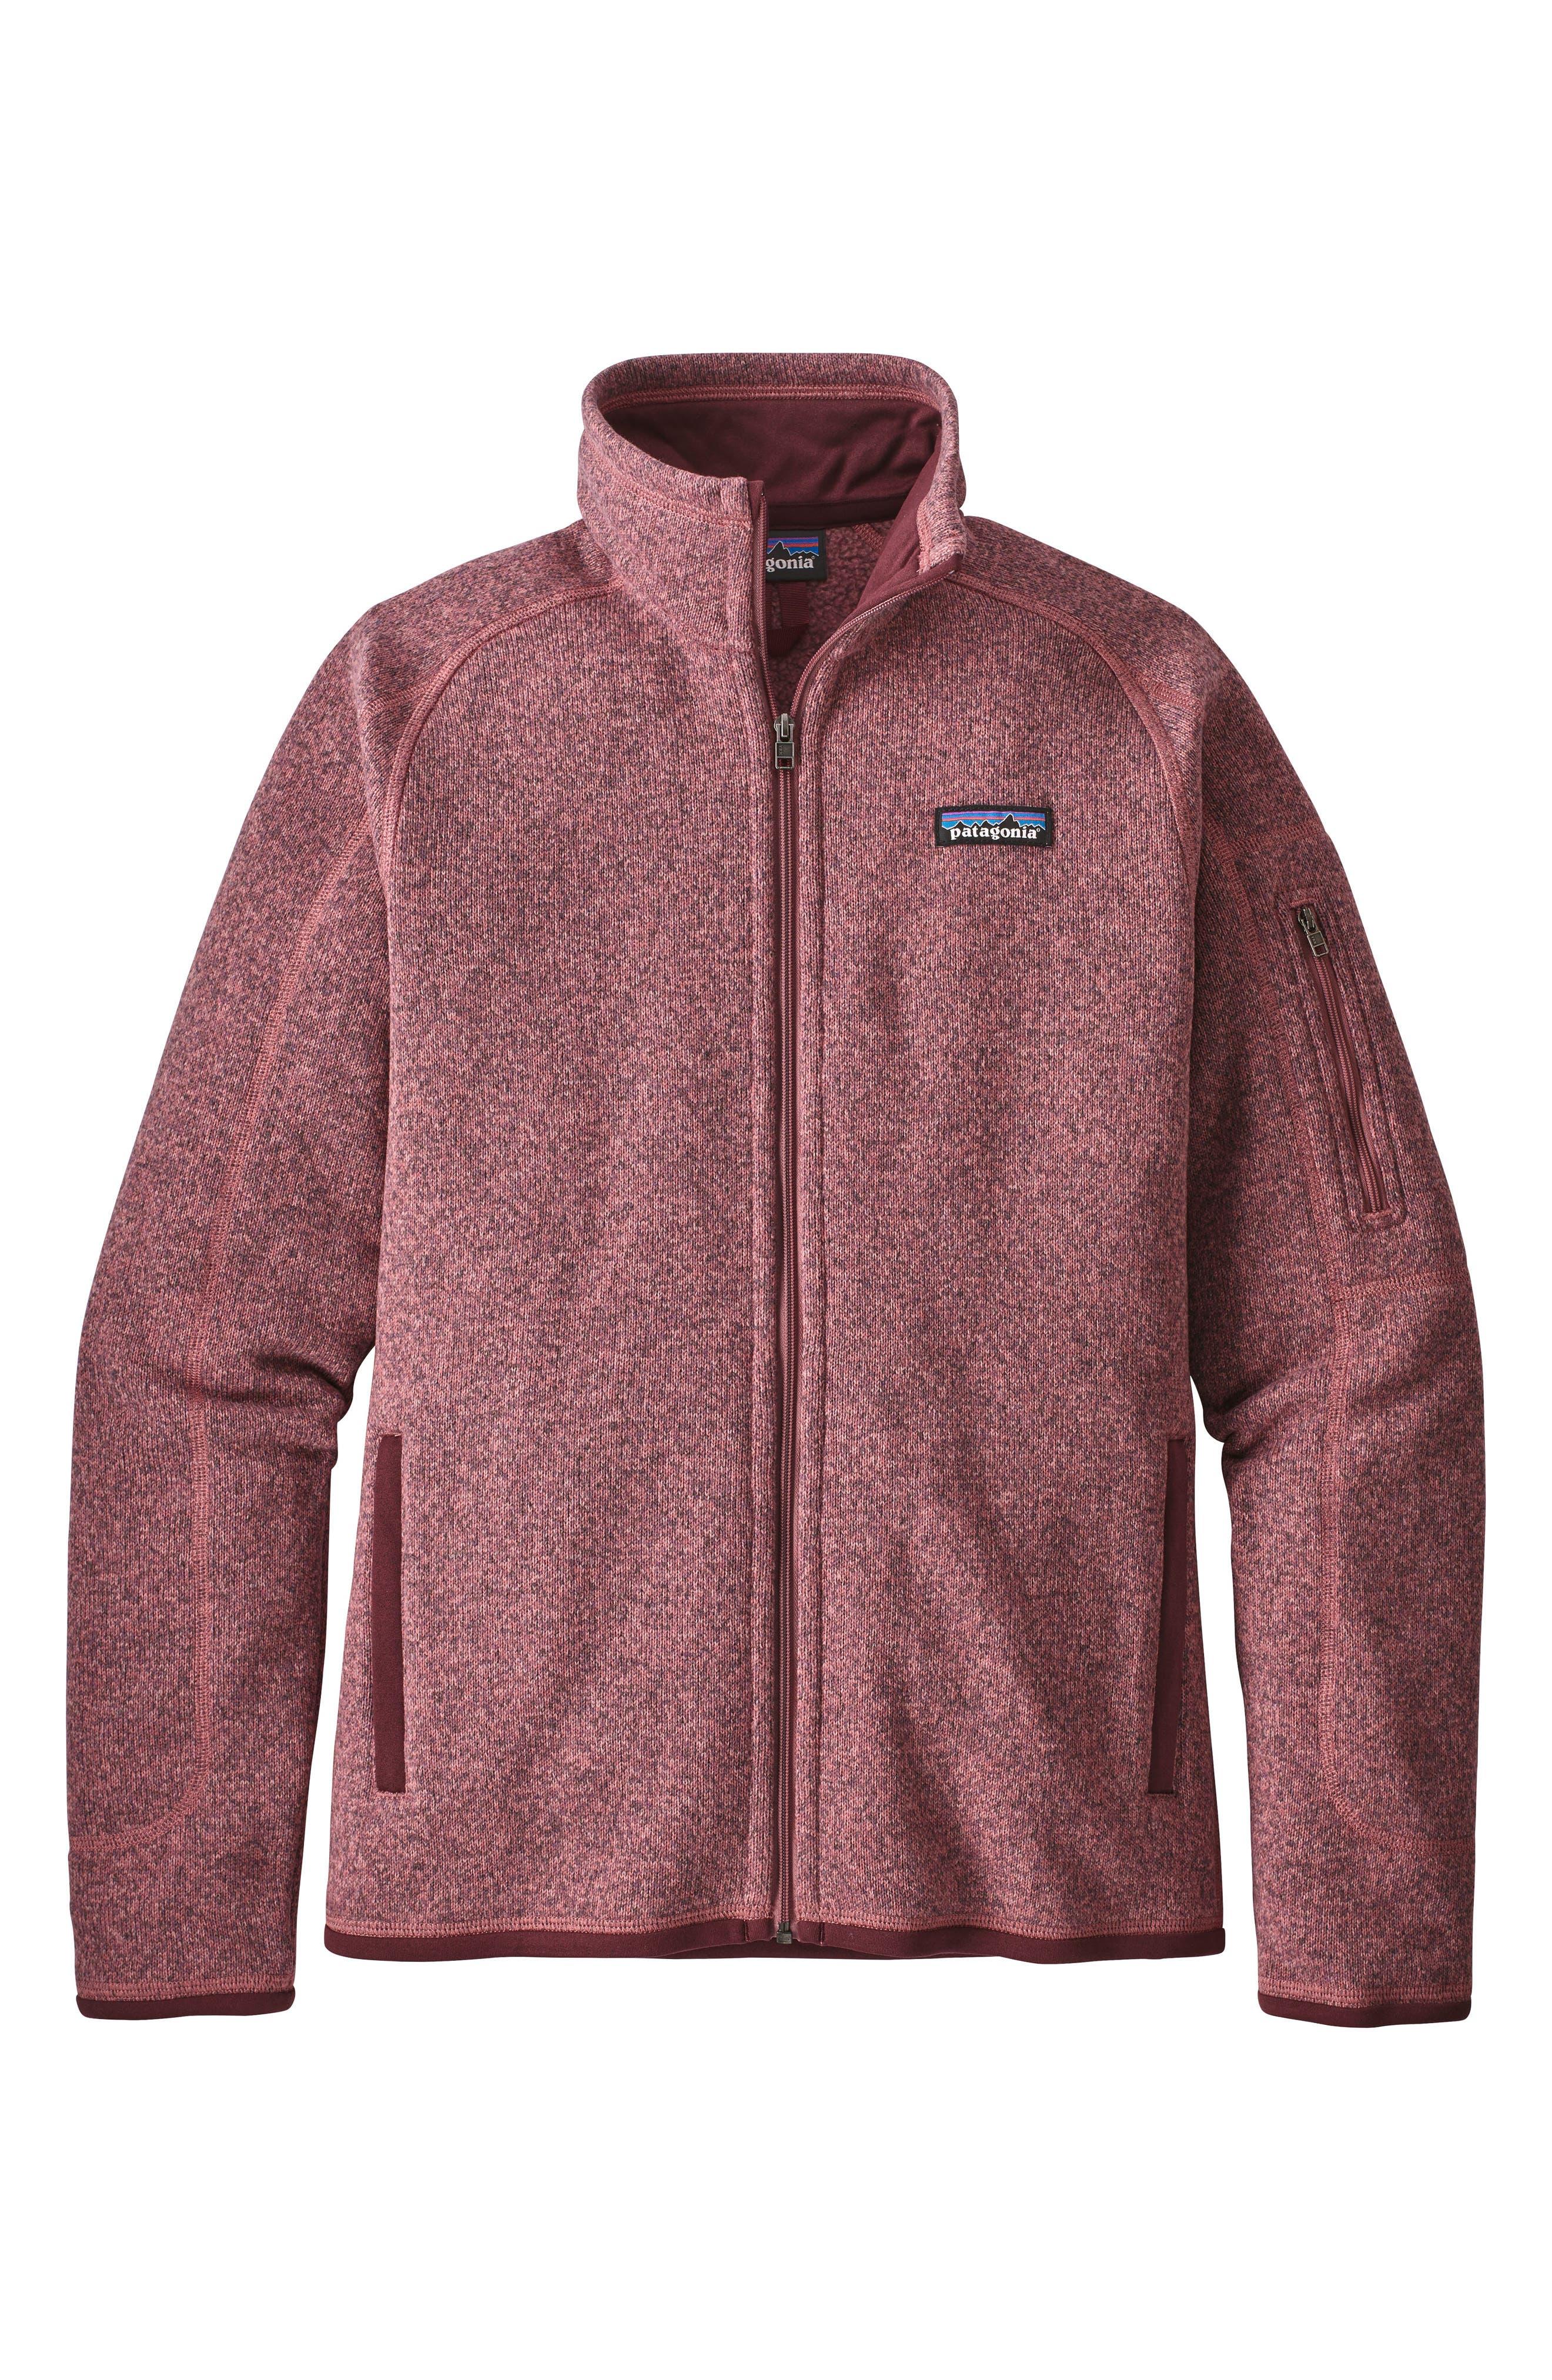 Women's Wear Coats Jackets Nordstrom amp; Snow vR5vrfxq